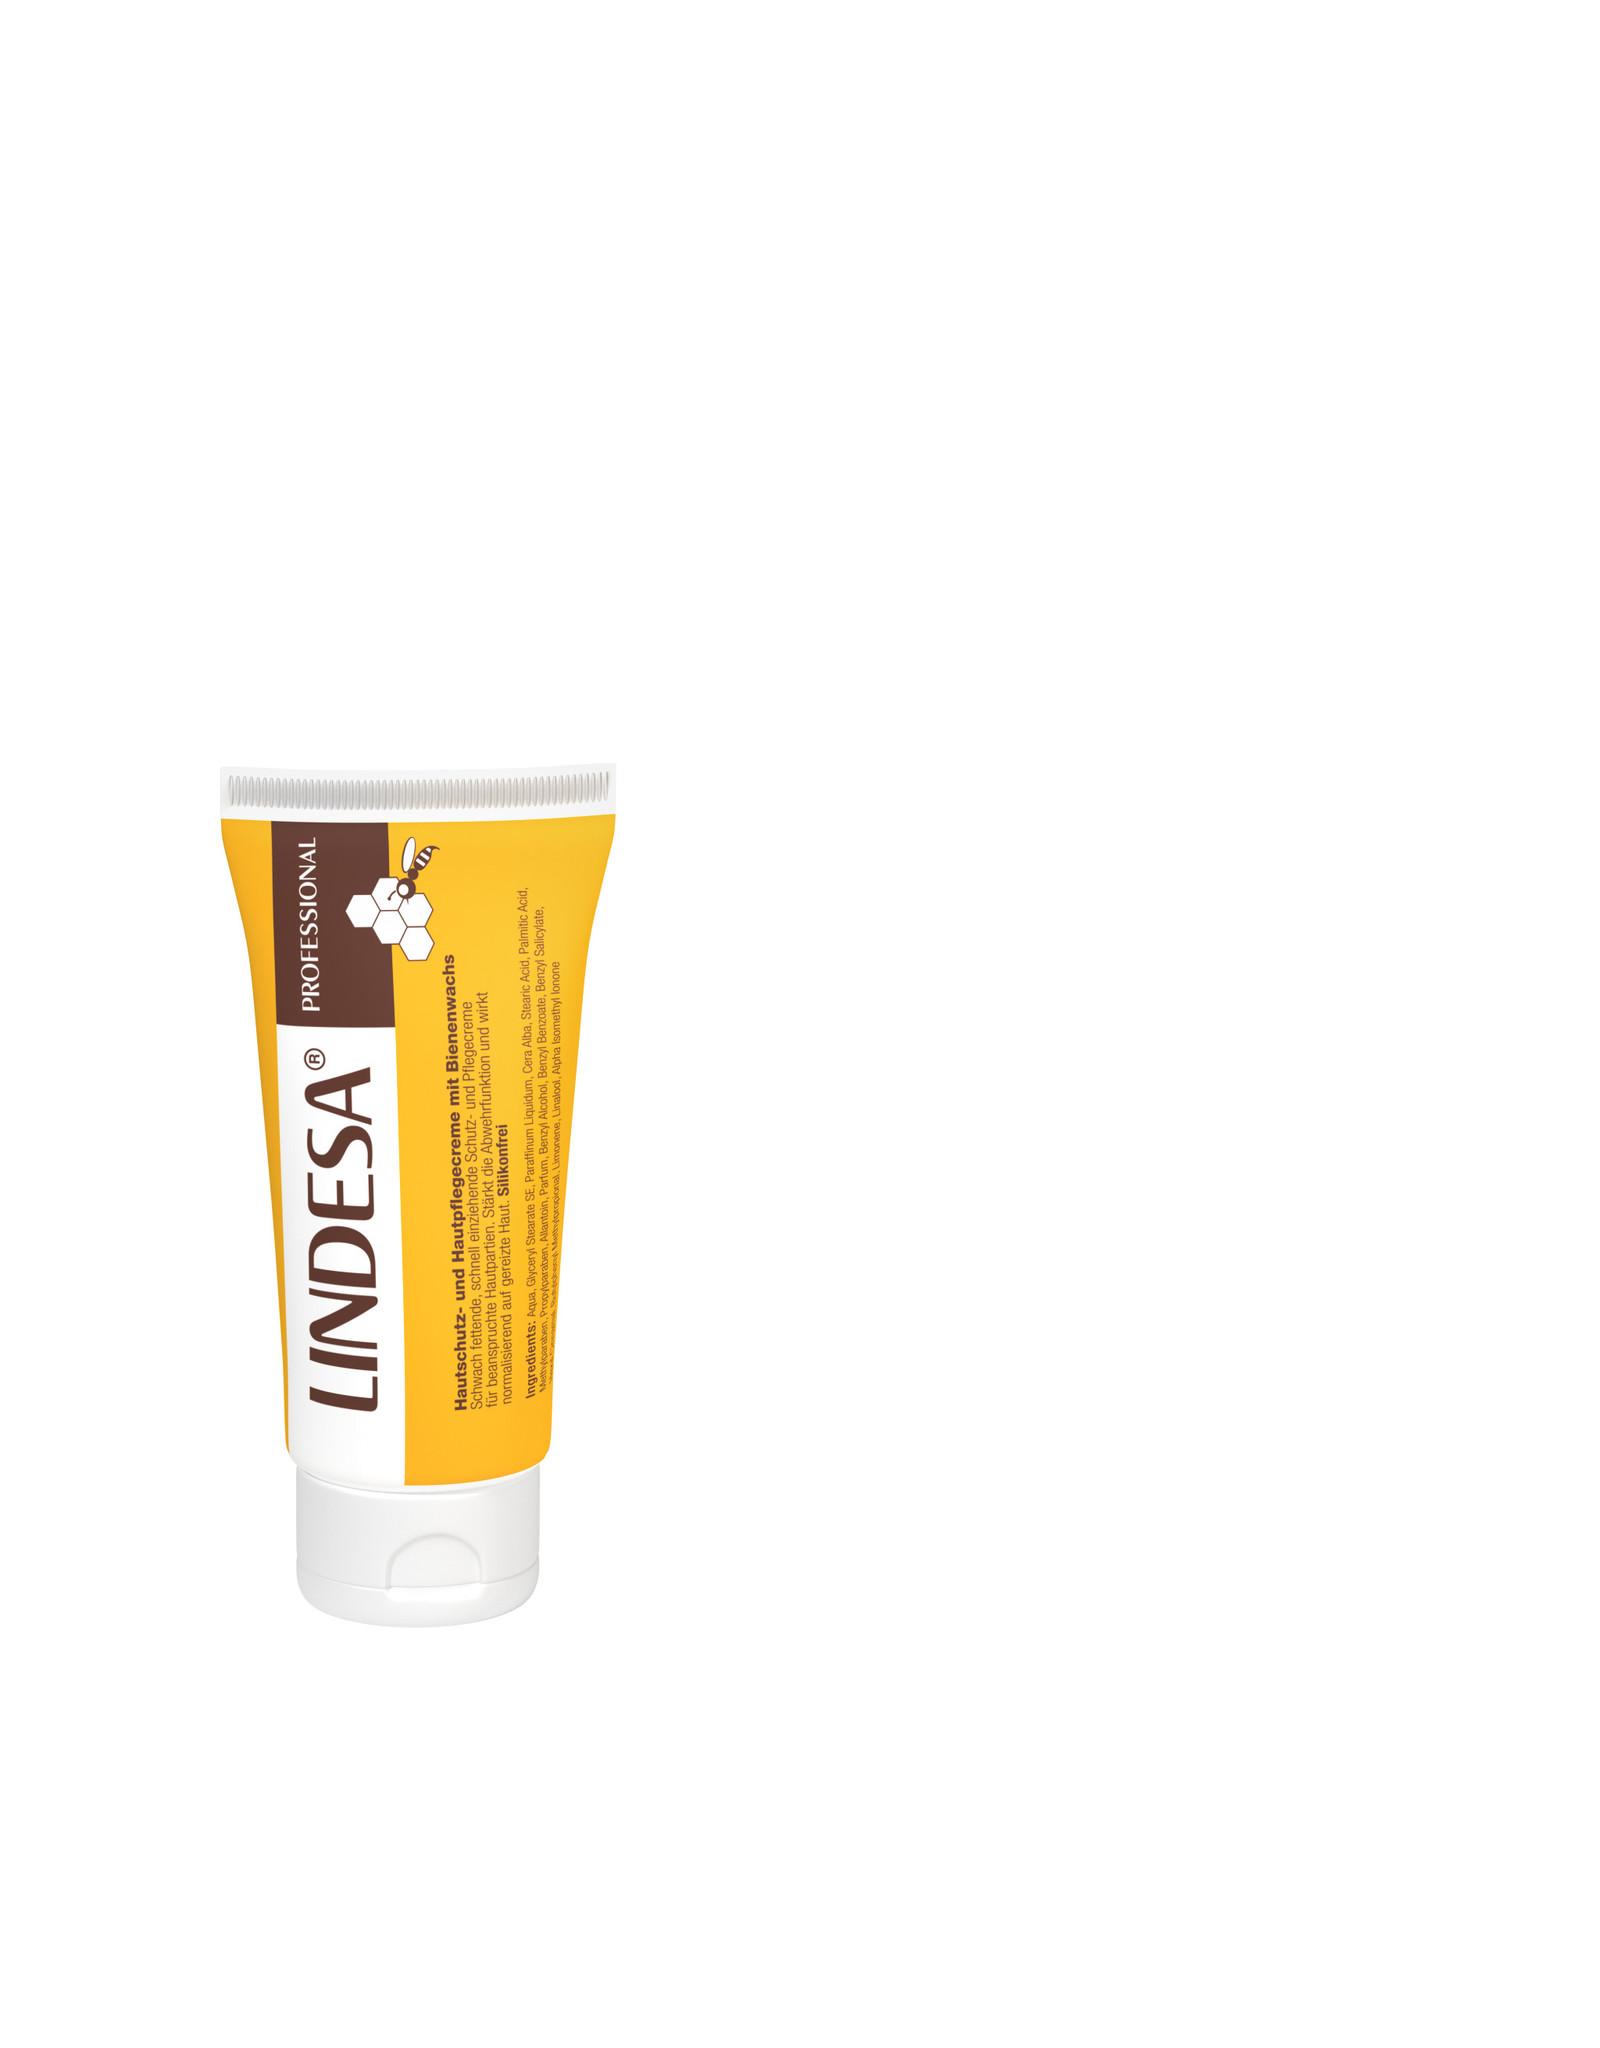 Physioderm Lindesa Professional huidverzorgingscrème 50ml